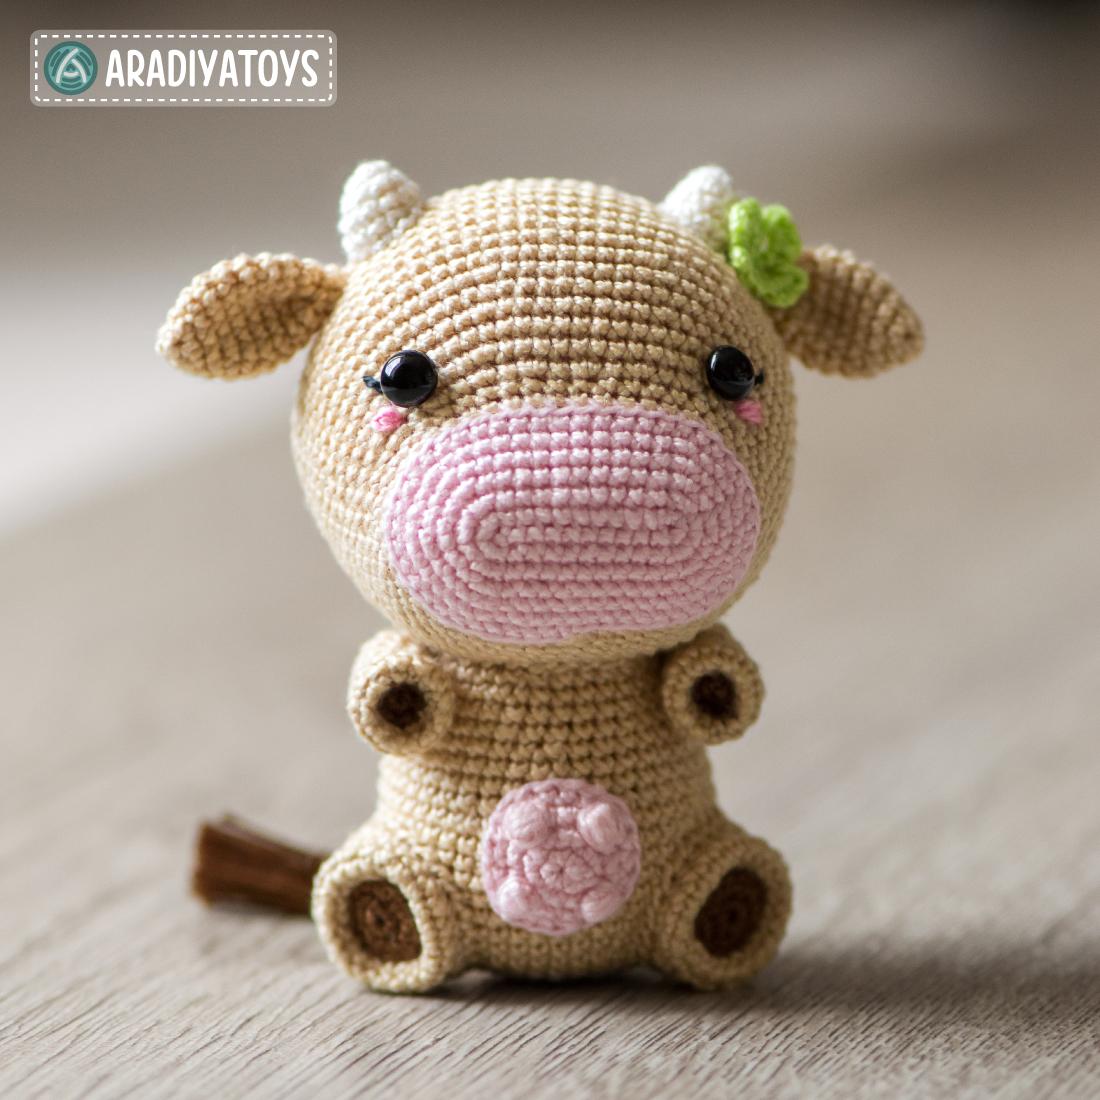 "Modèle au crochet de Mia la vache de ""AradiyaToys Design"""